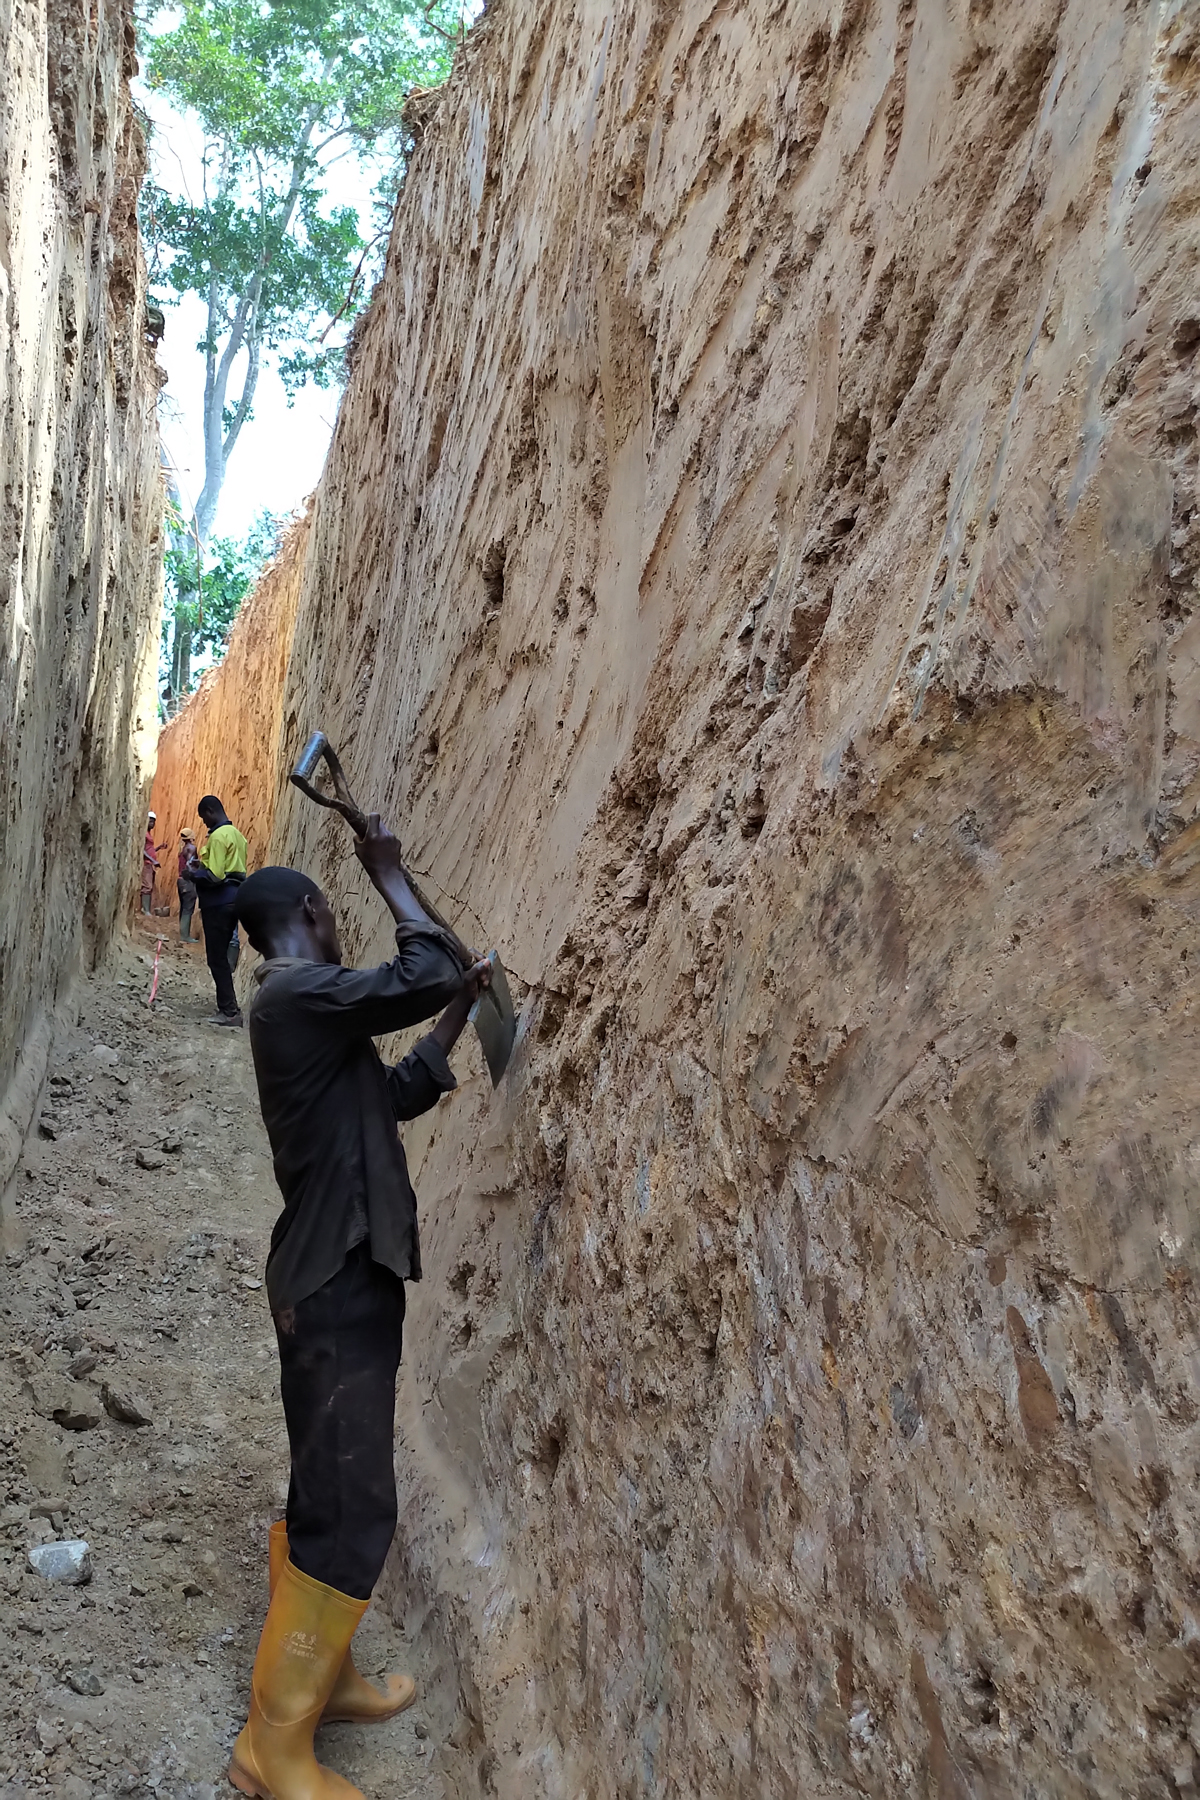 Kubi East TR3 - Working preparing trench wall for sampling